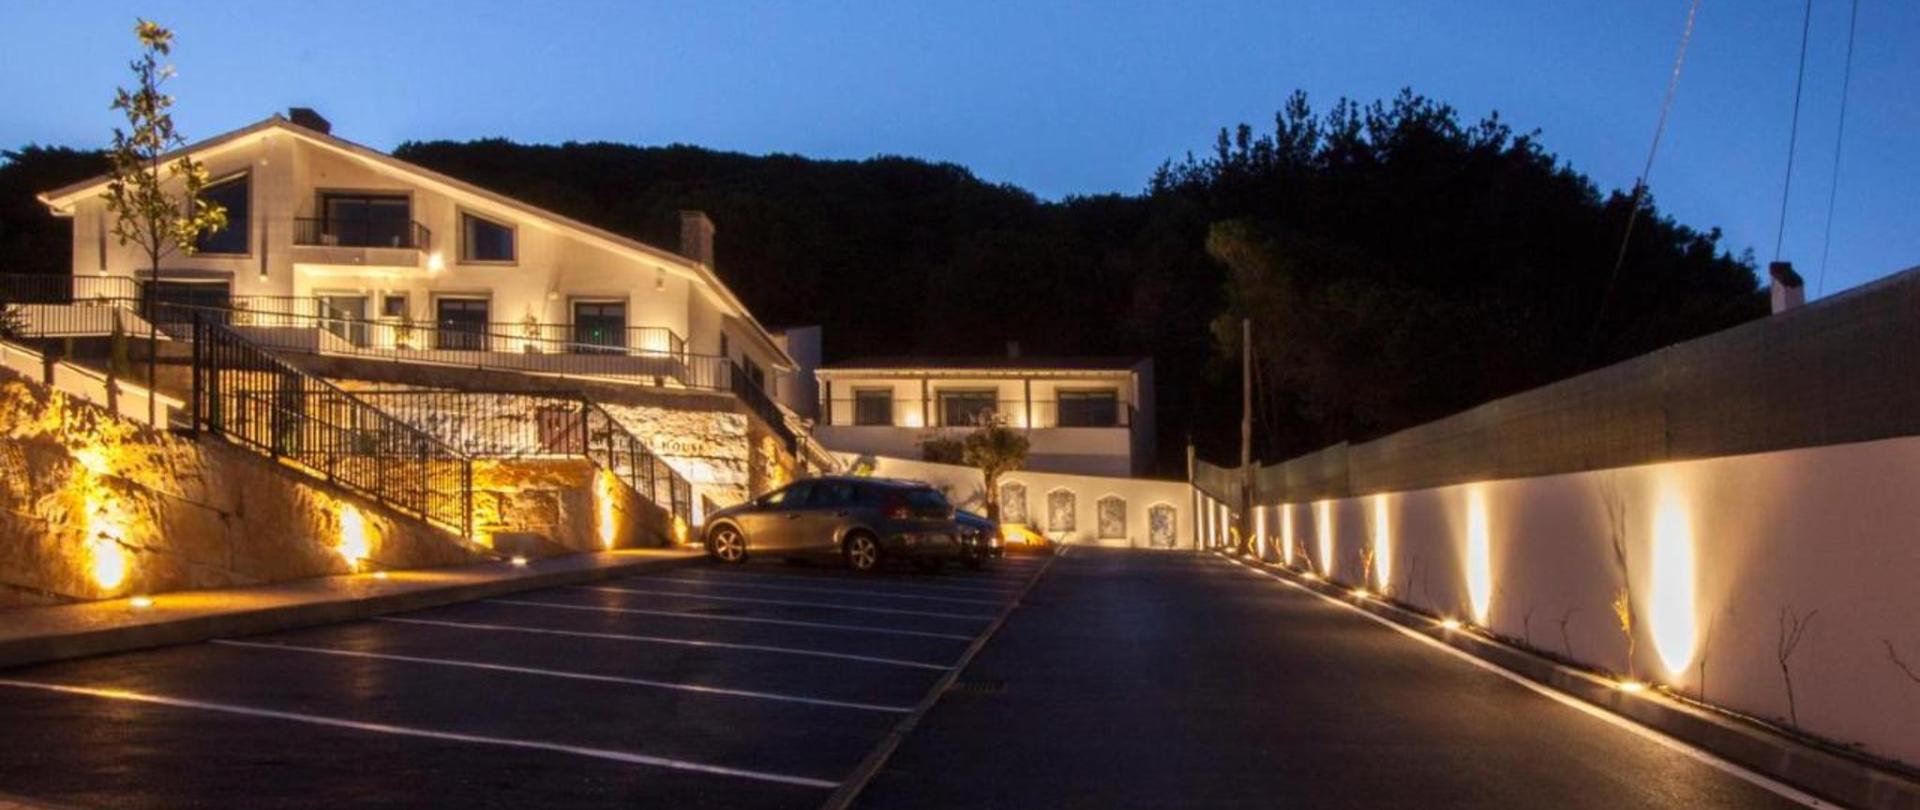 Hillside House Suites & Spa